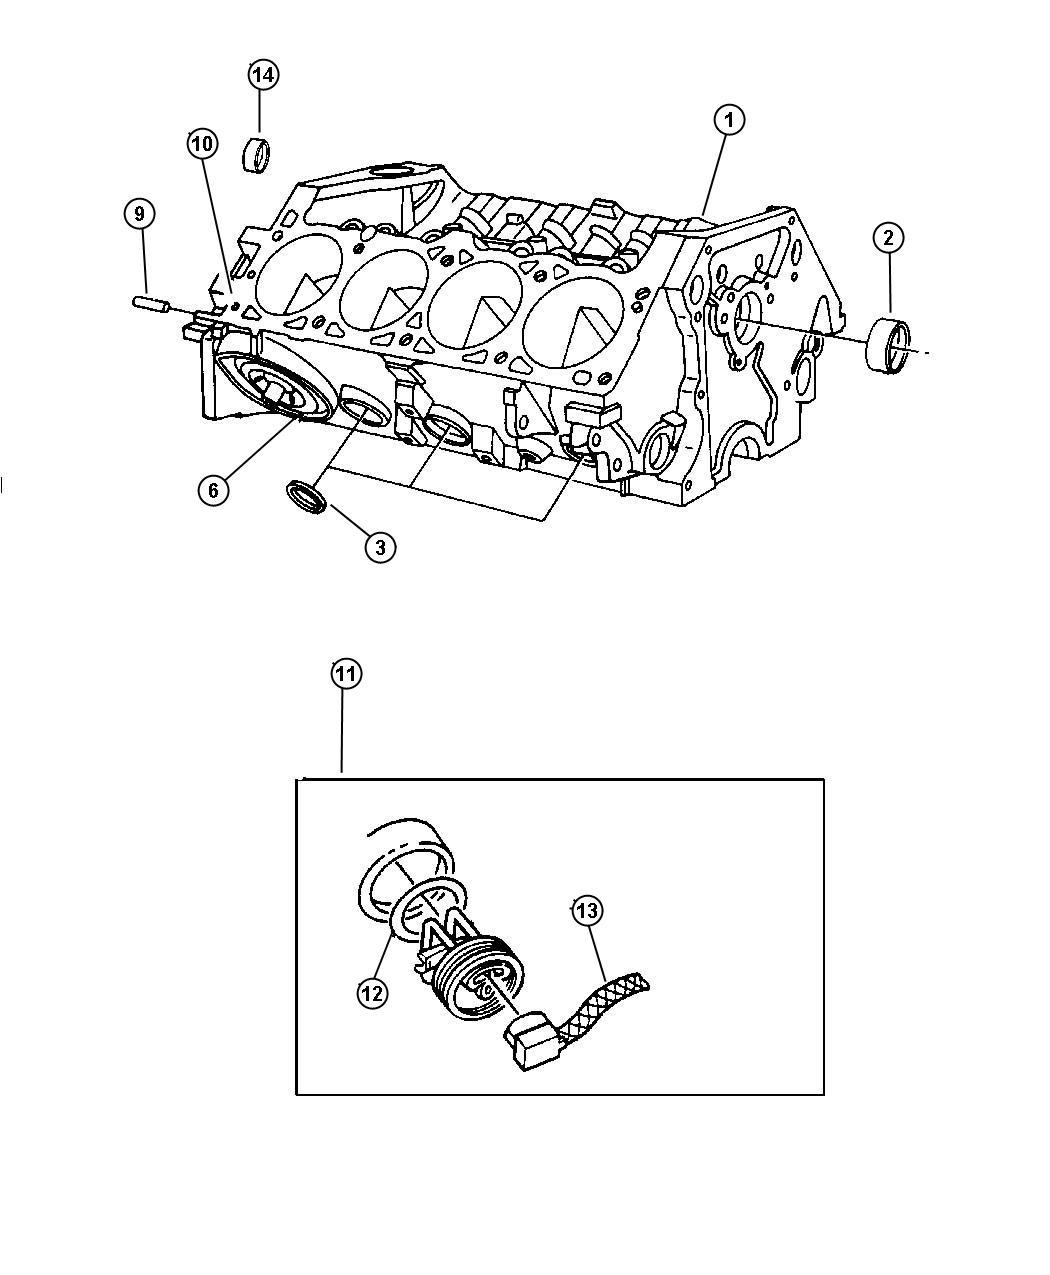 Dodge Dakota Plug. Cylinder block. Rubber, rubber style